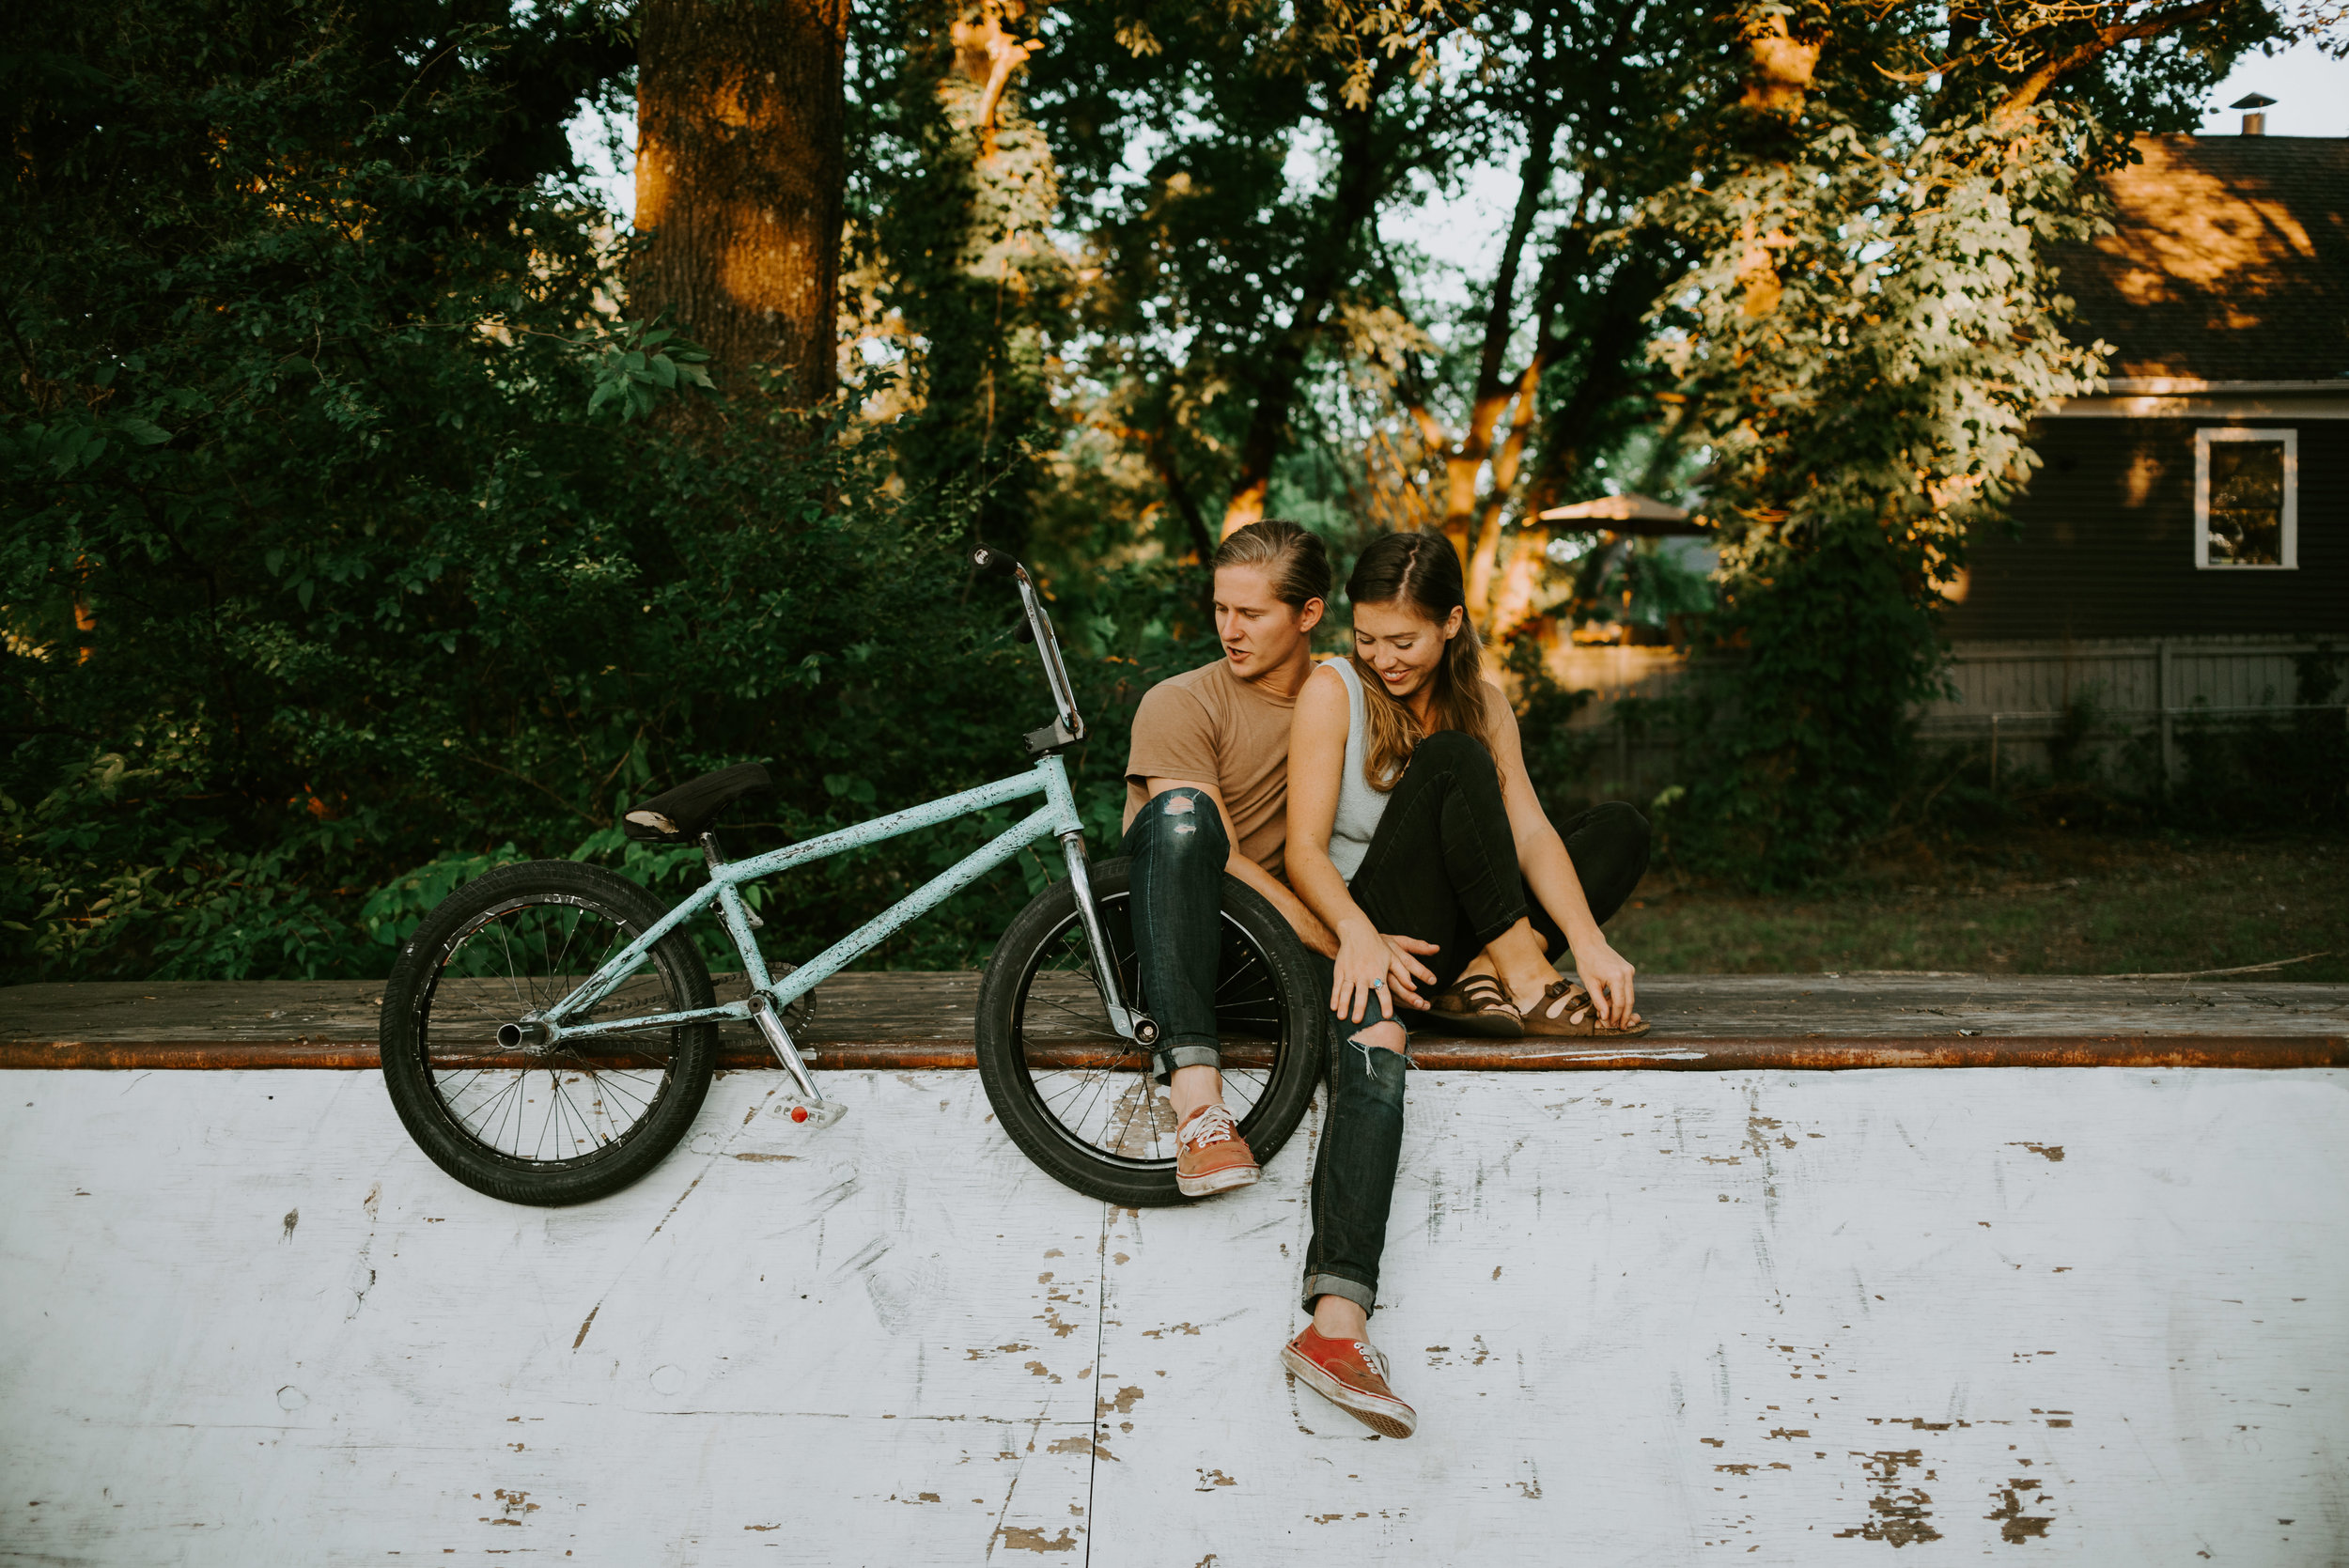 WonderlyCreative_Couples_7.9.18_Cameron&Alexis_-210.jpg